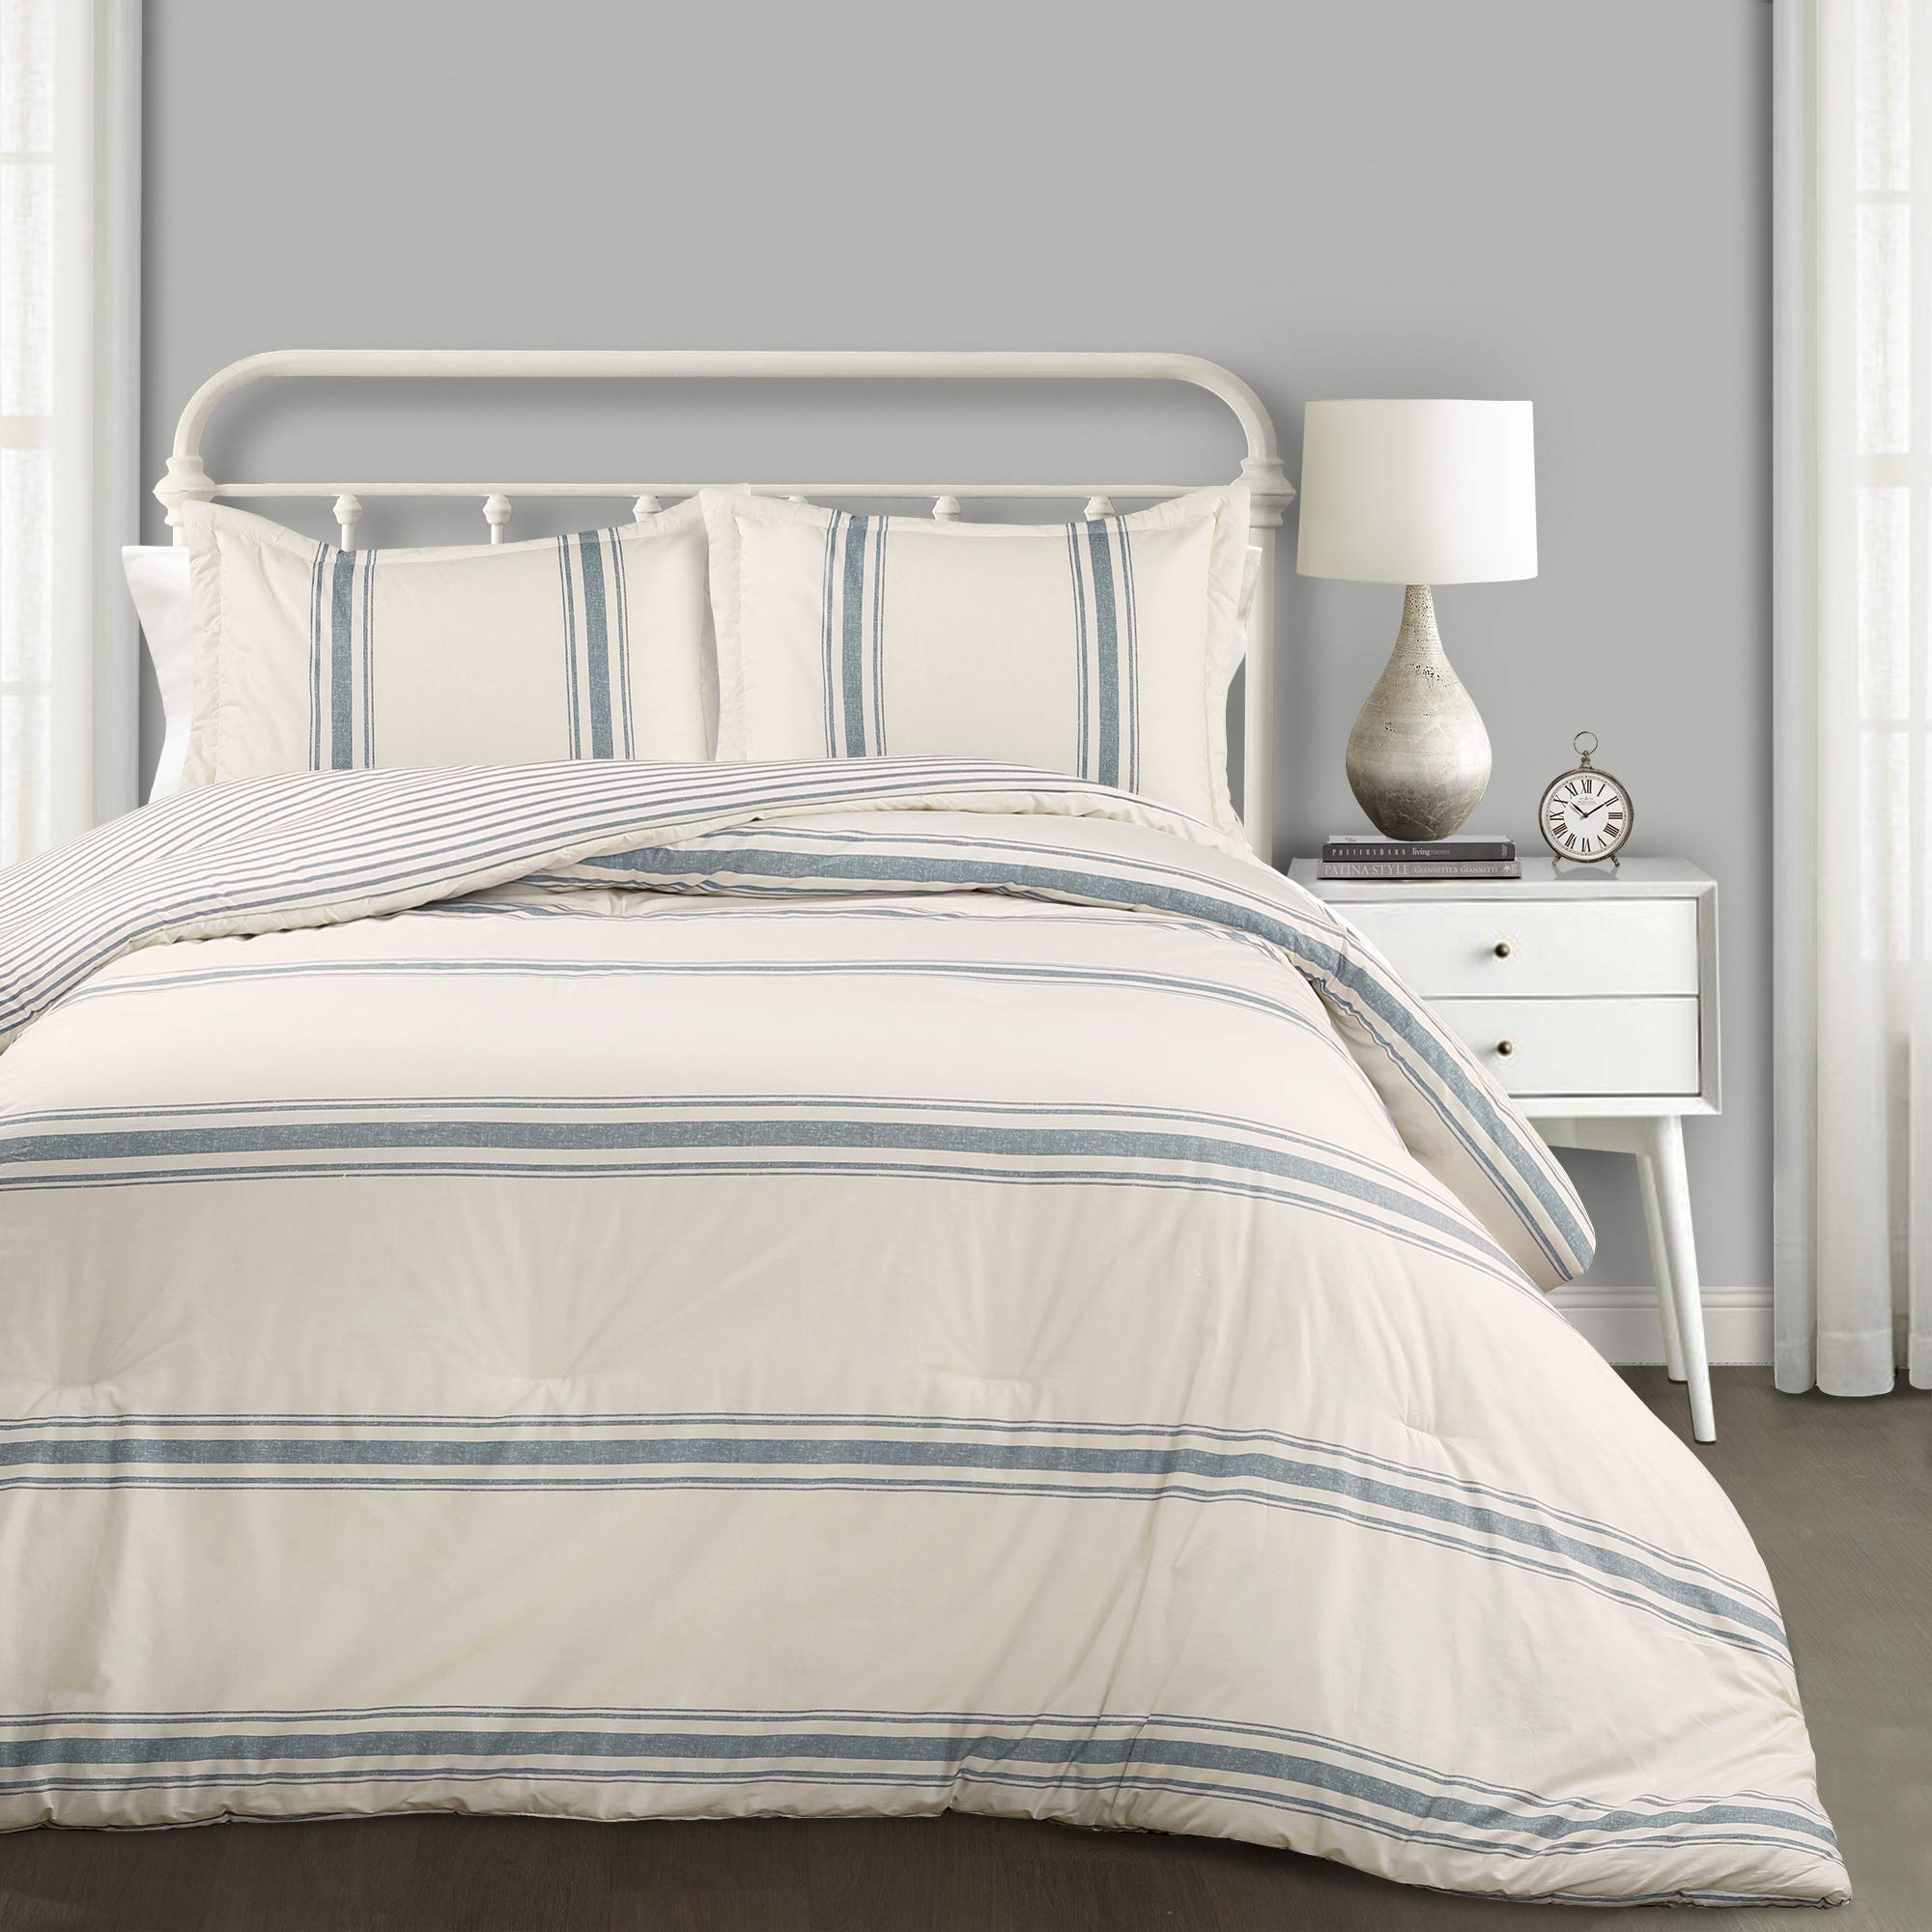 Amazon Com Lush Decor Comforter Farmhouse Stripe 3 Piece Reversible Bedding Set King Blue Home Kitchen